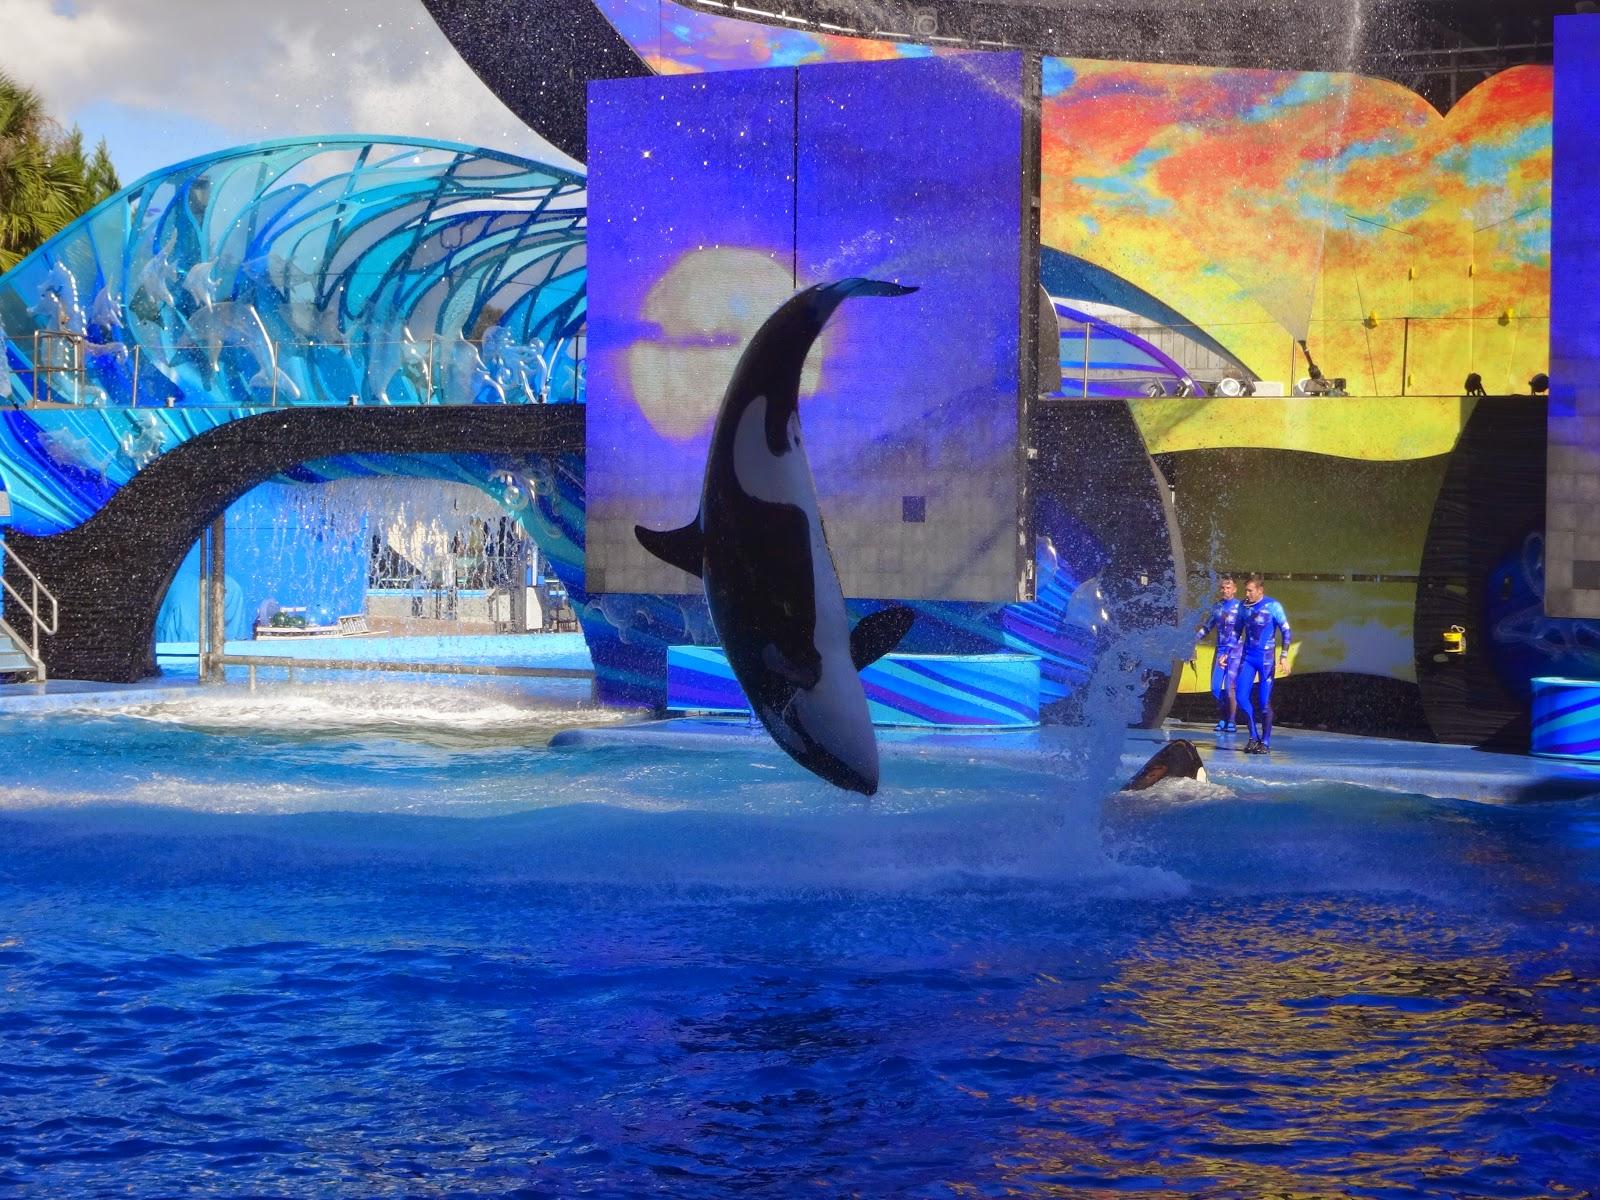 shamu adventure - Parque sea world - orlando, florida